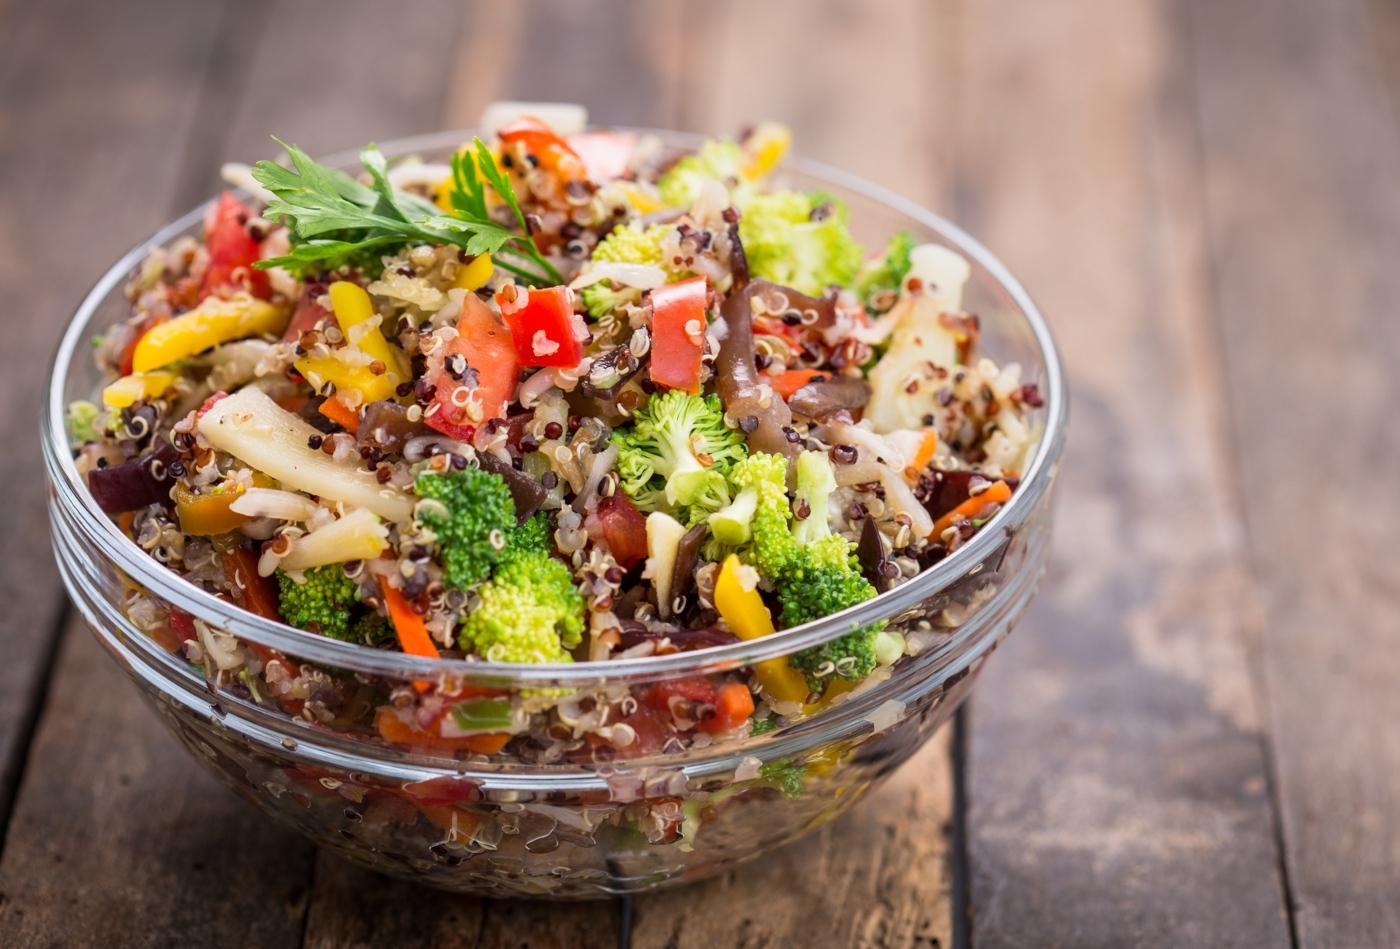 Cogumelos com legumes salteados e quinoa